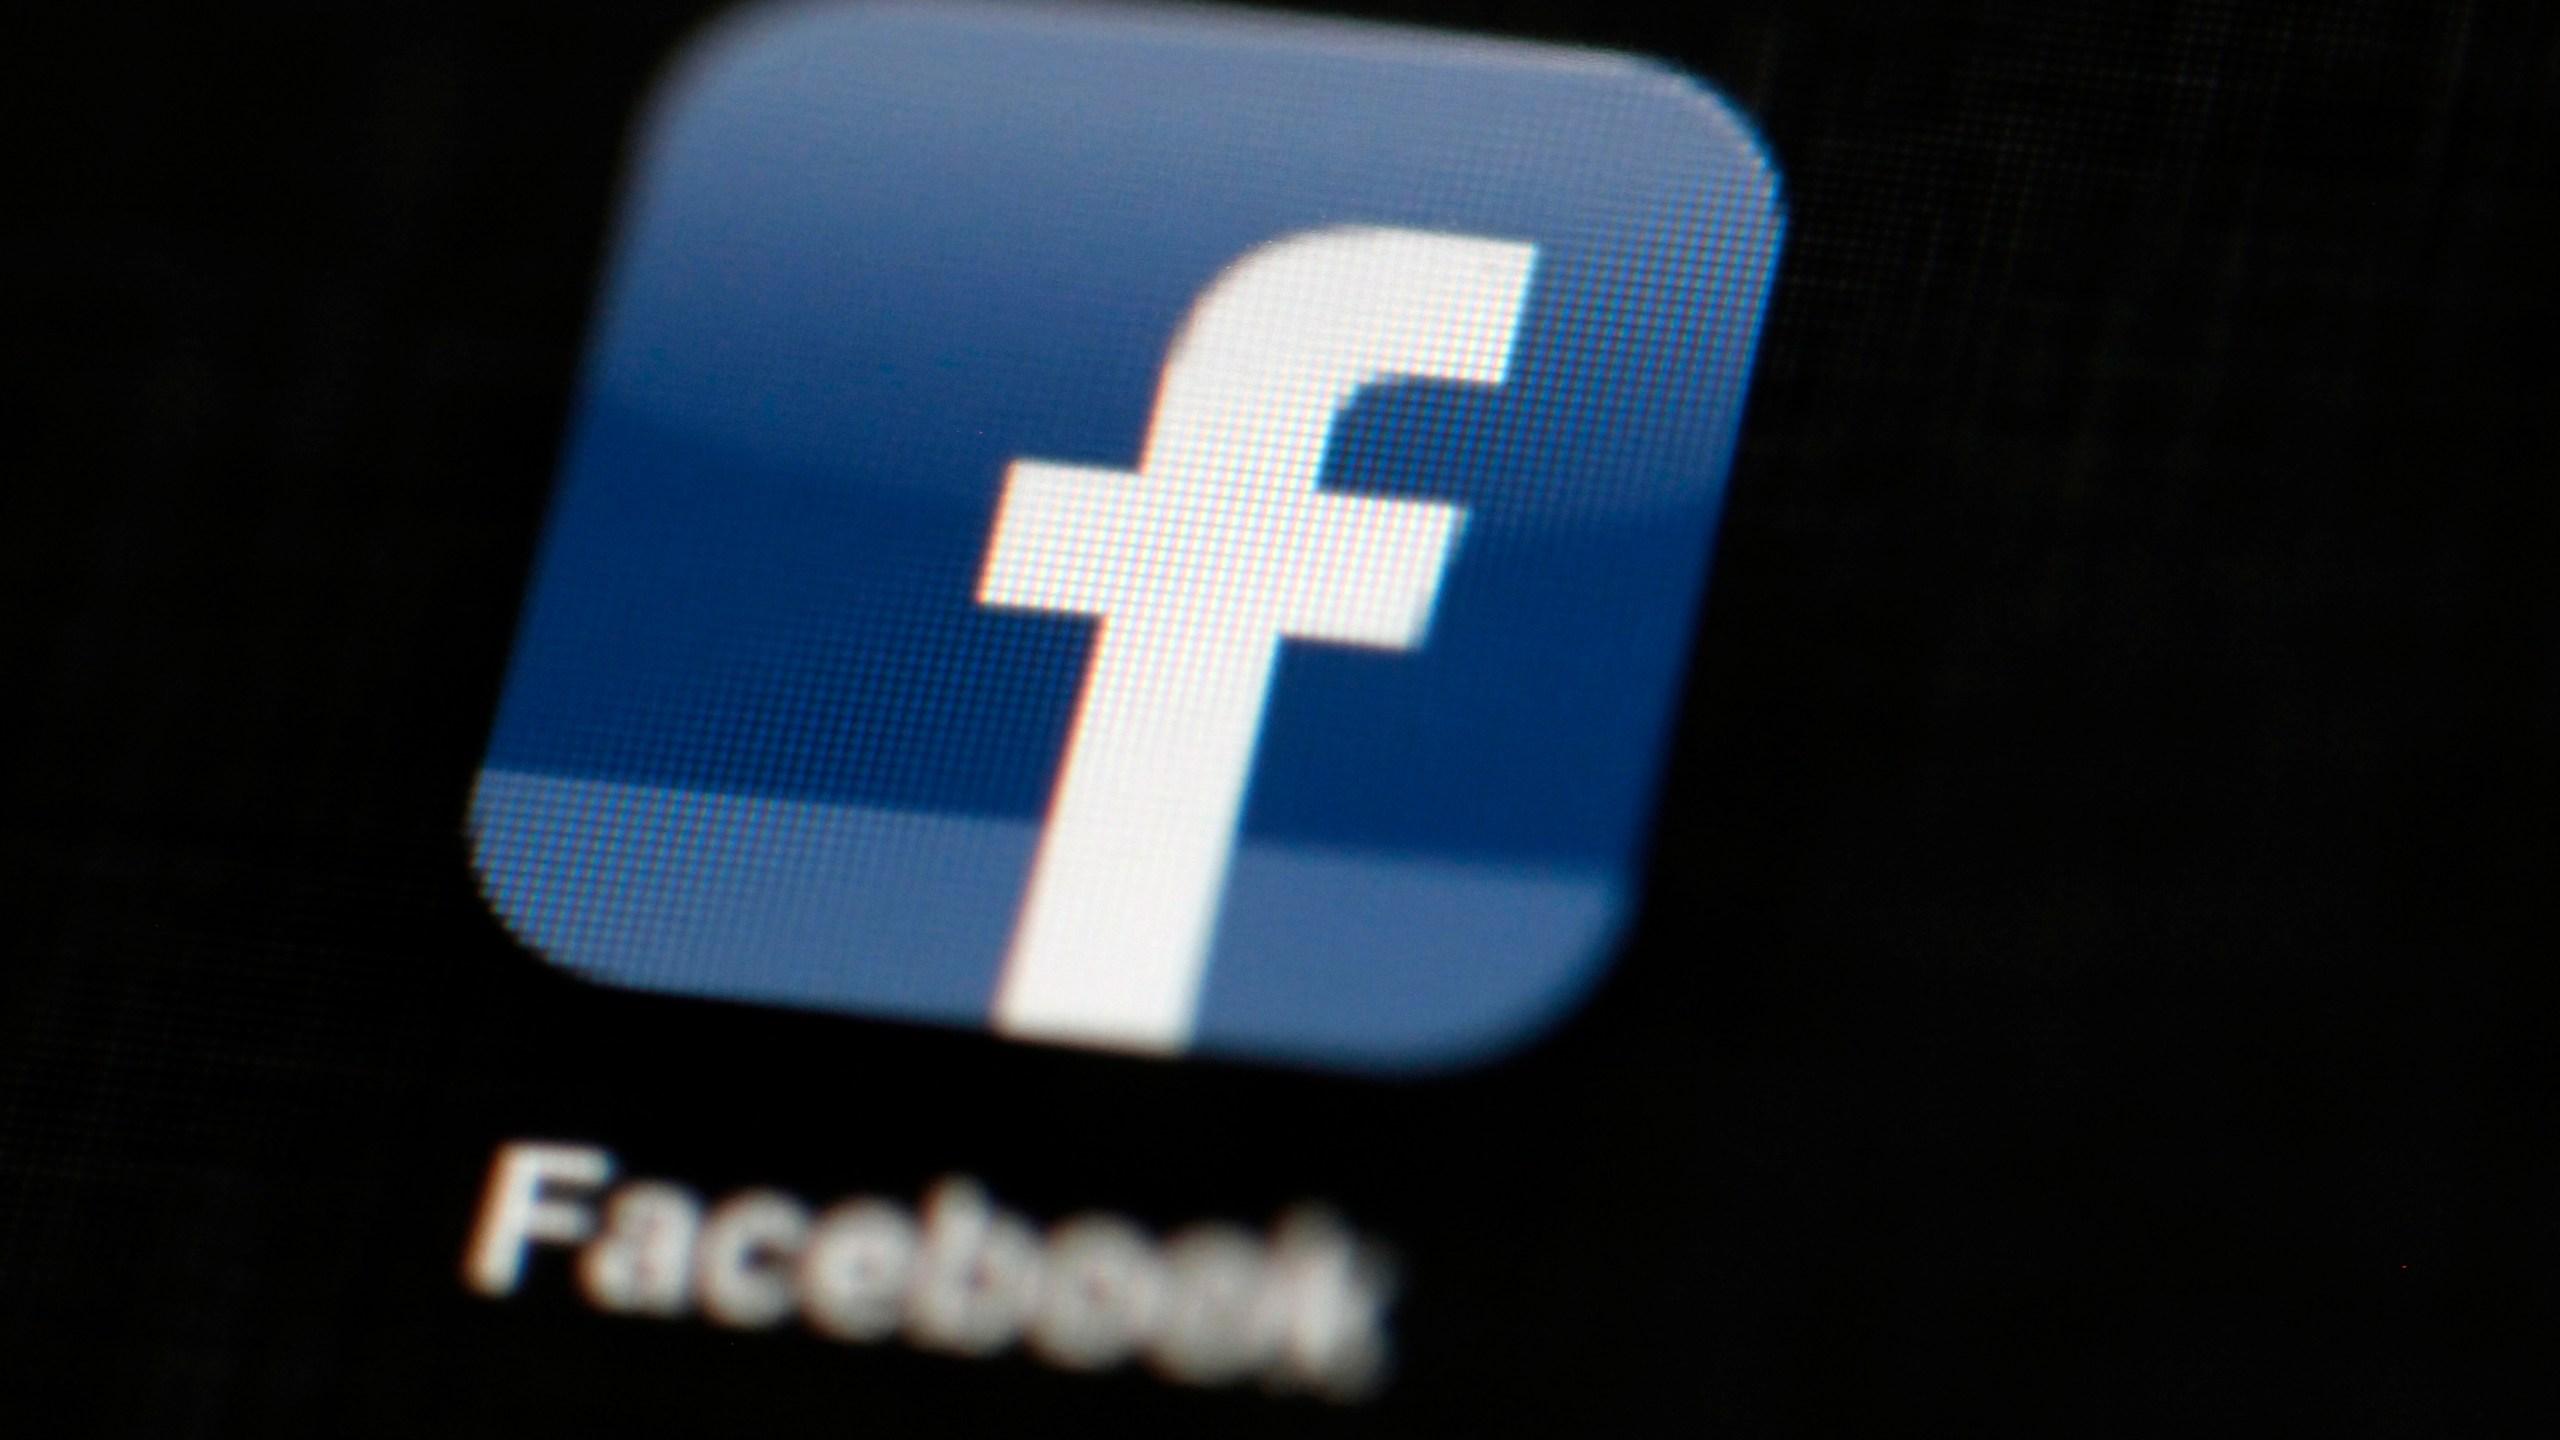 Facebook_Elections_Disruption_60352-159532.jpg05060991